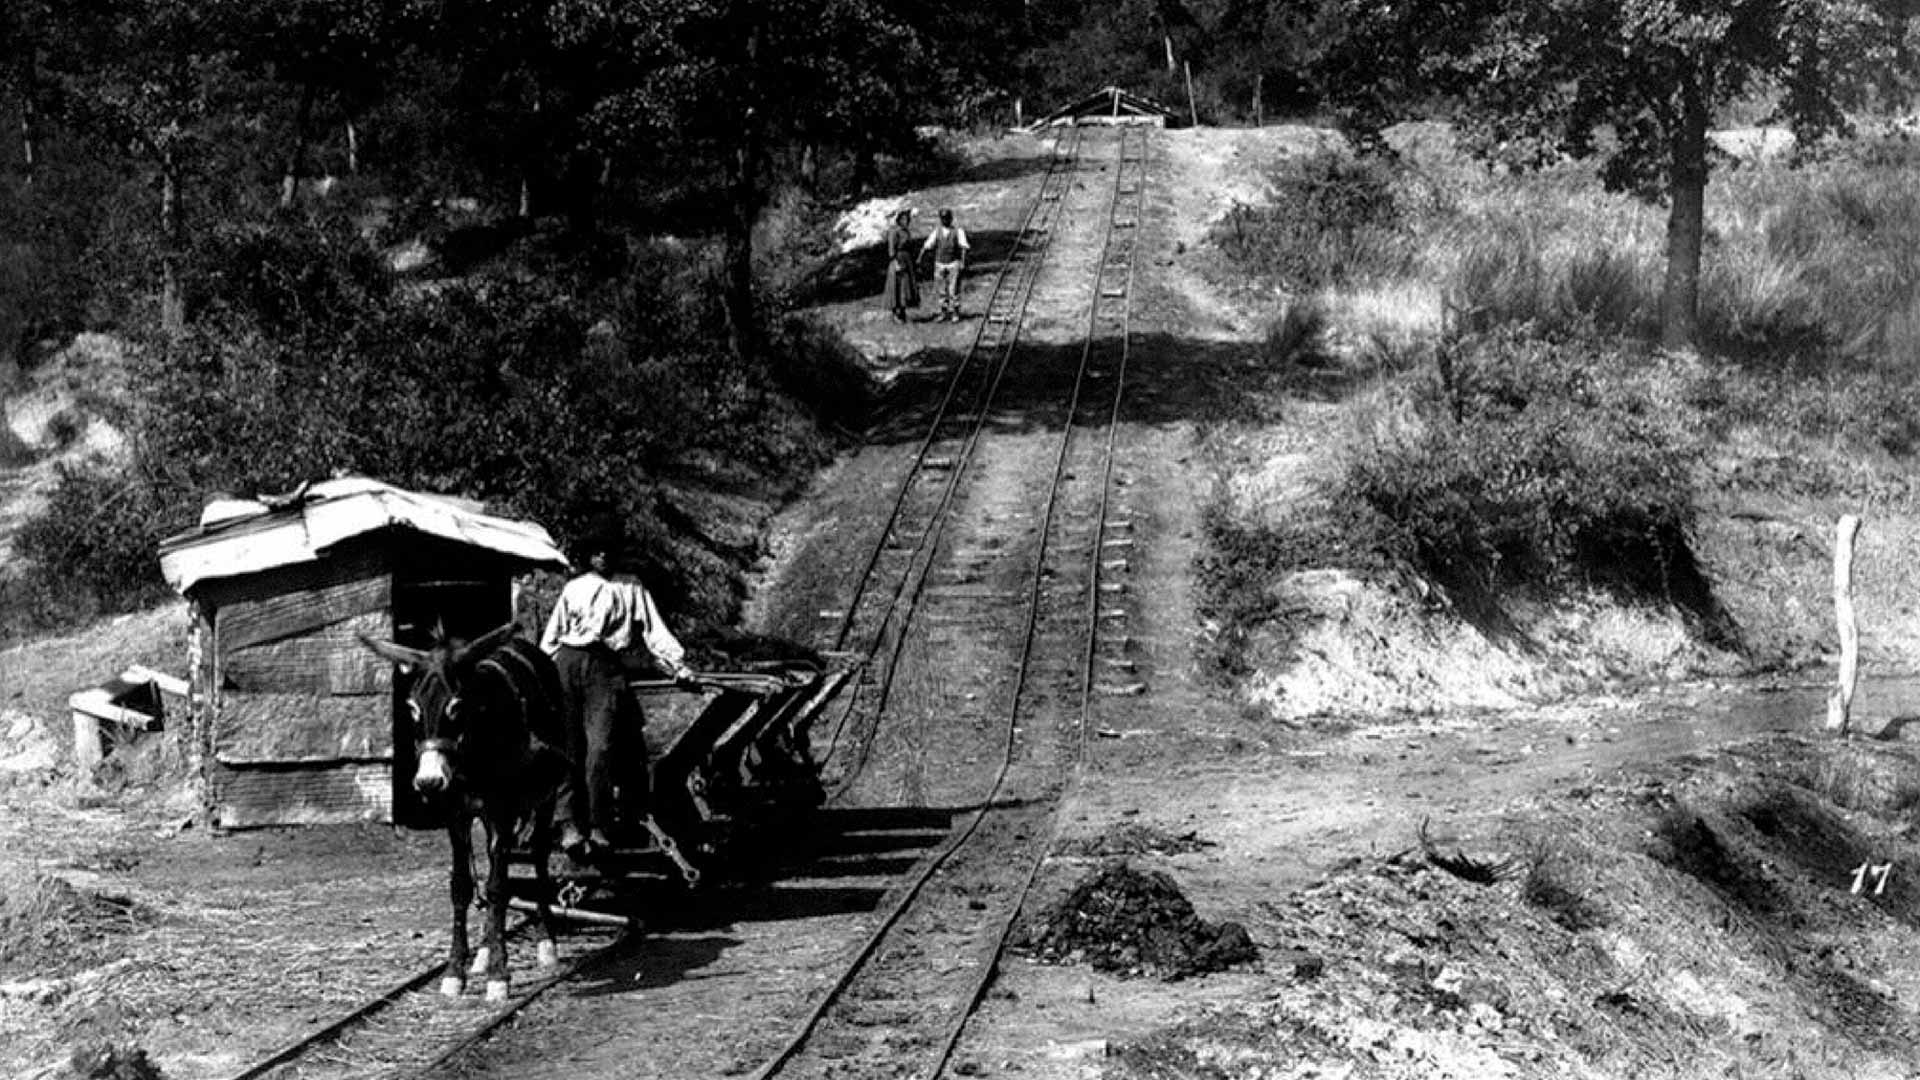 Raccolta carbone. Archivio fotografico Alinari.